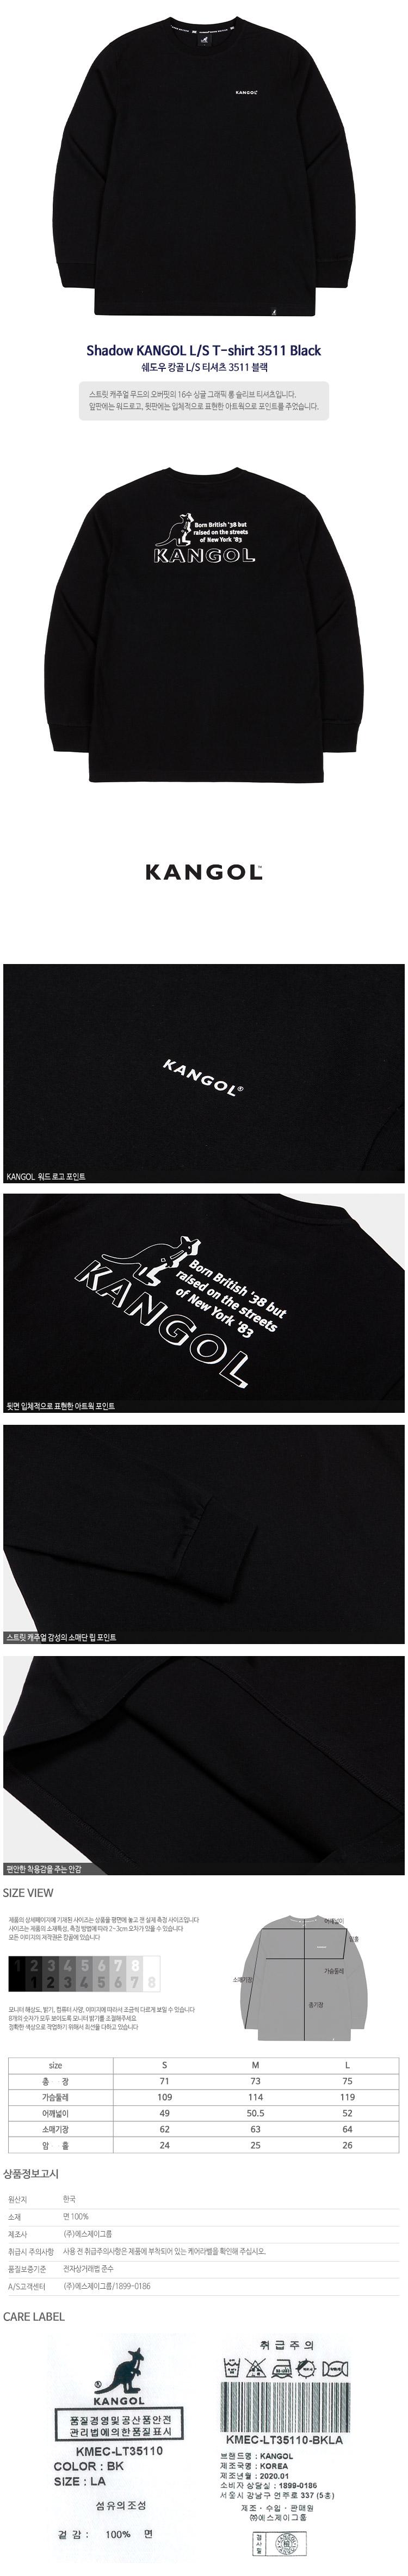 Shadow KANGOL L/S T-shirt 3511 BLACK